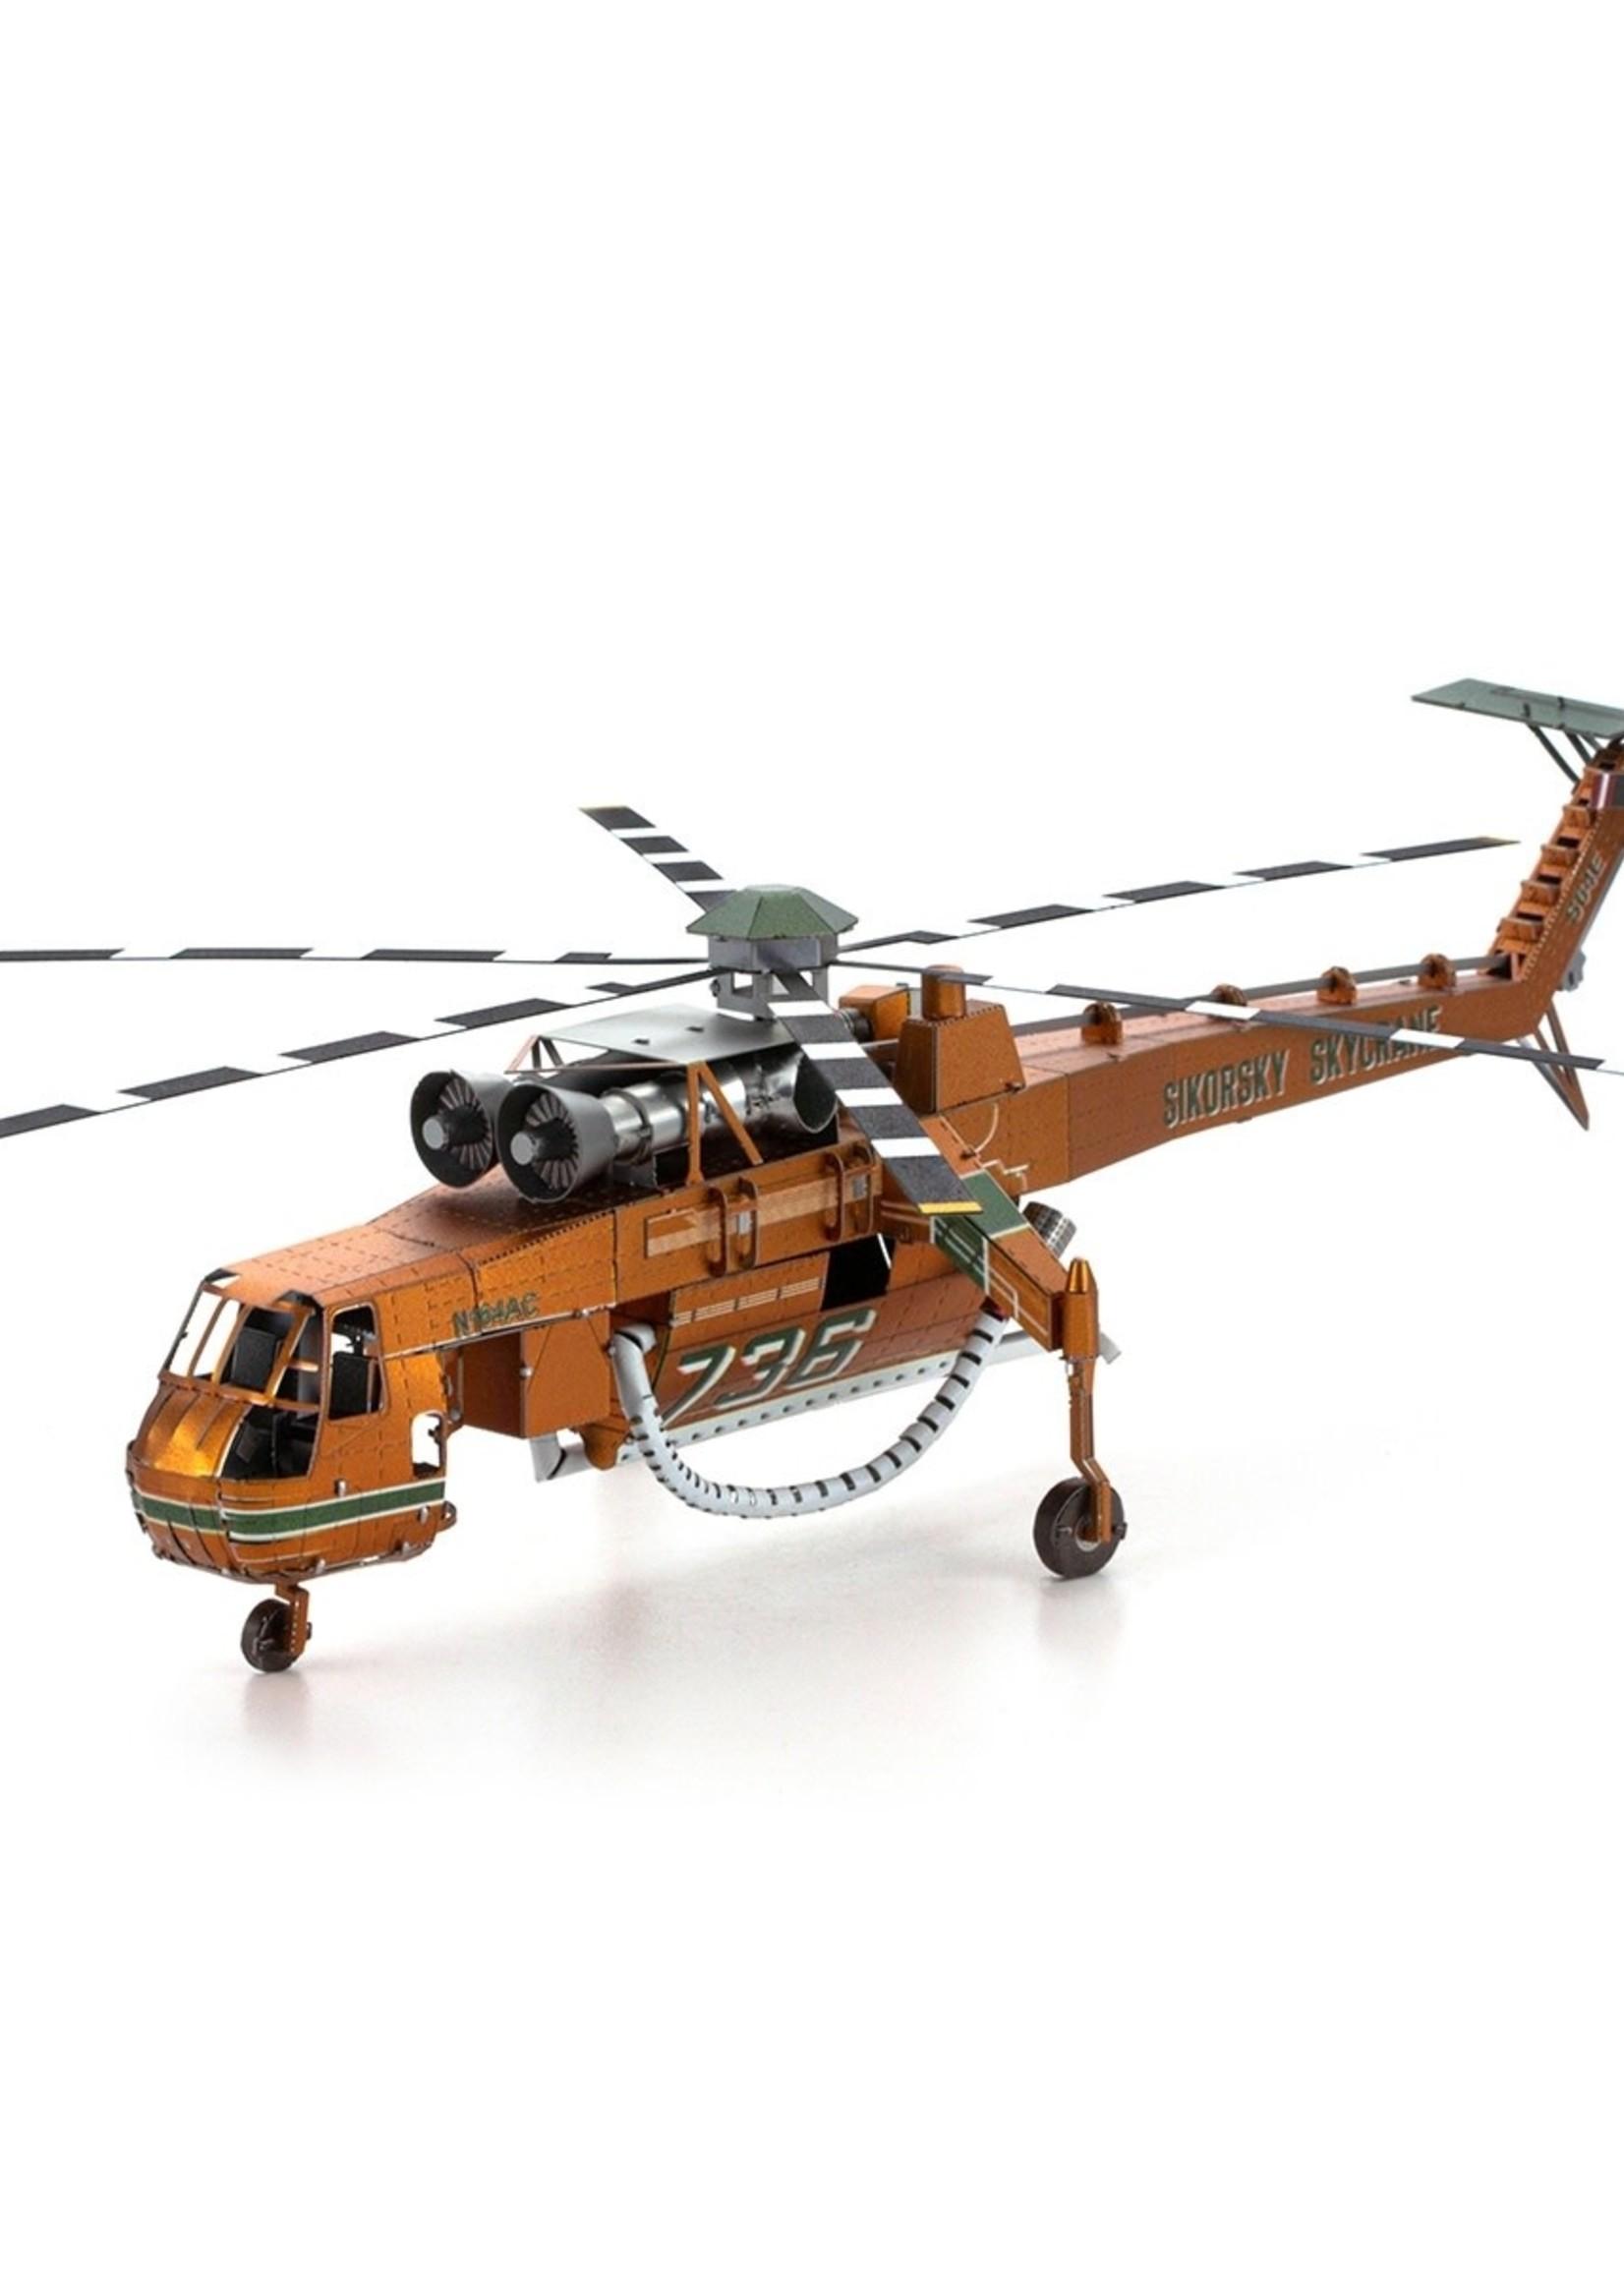 METAL EARTH S-64 Skycrane